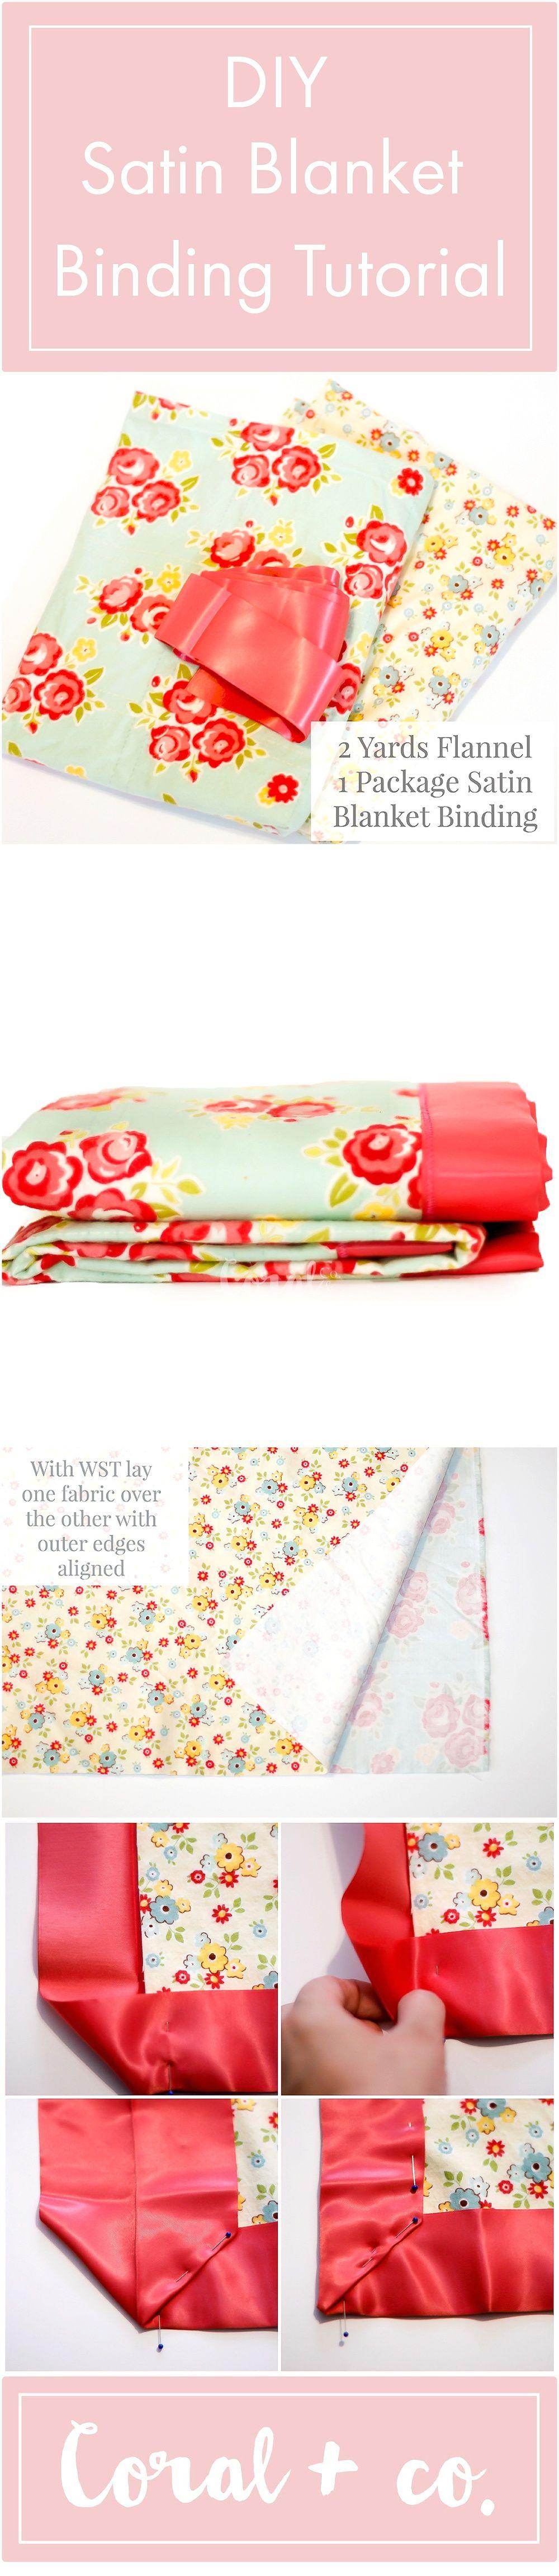 How to sew blanket binding on a baby blanket tutorial blanket